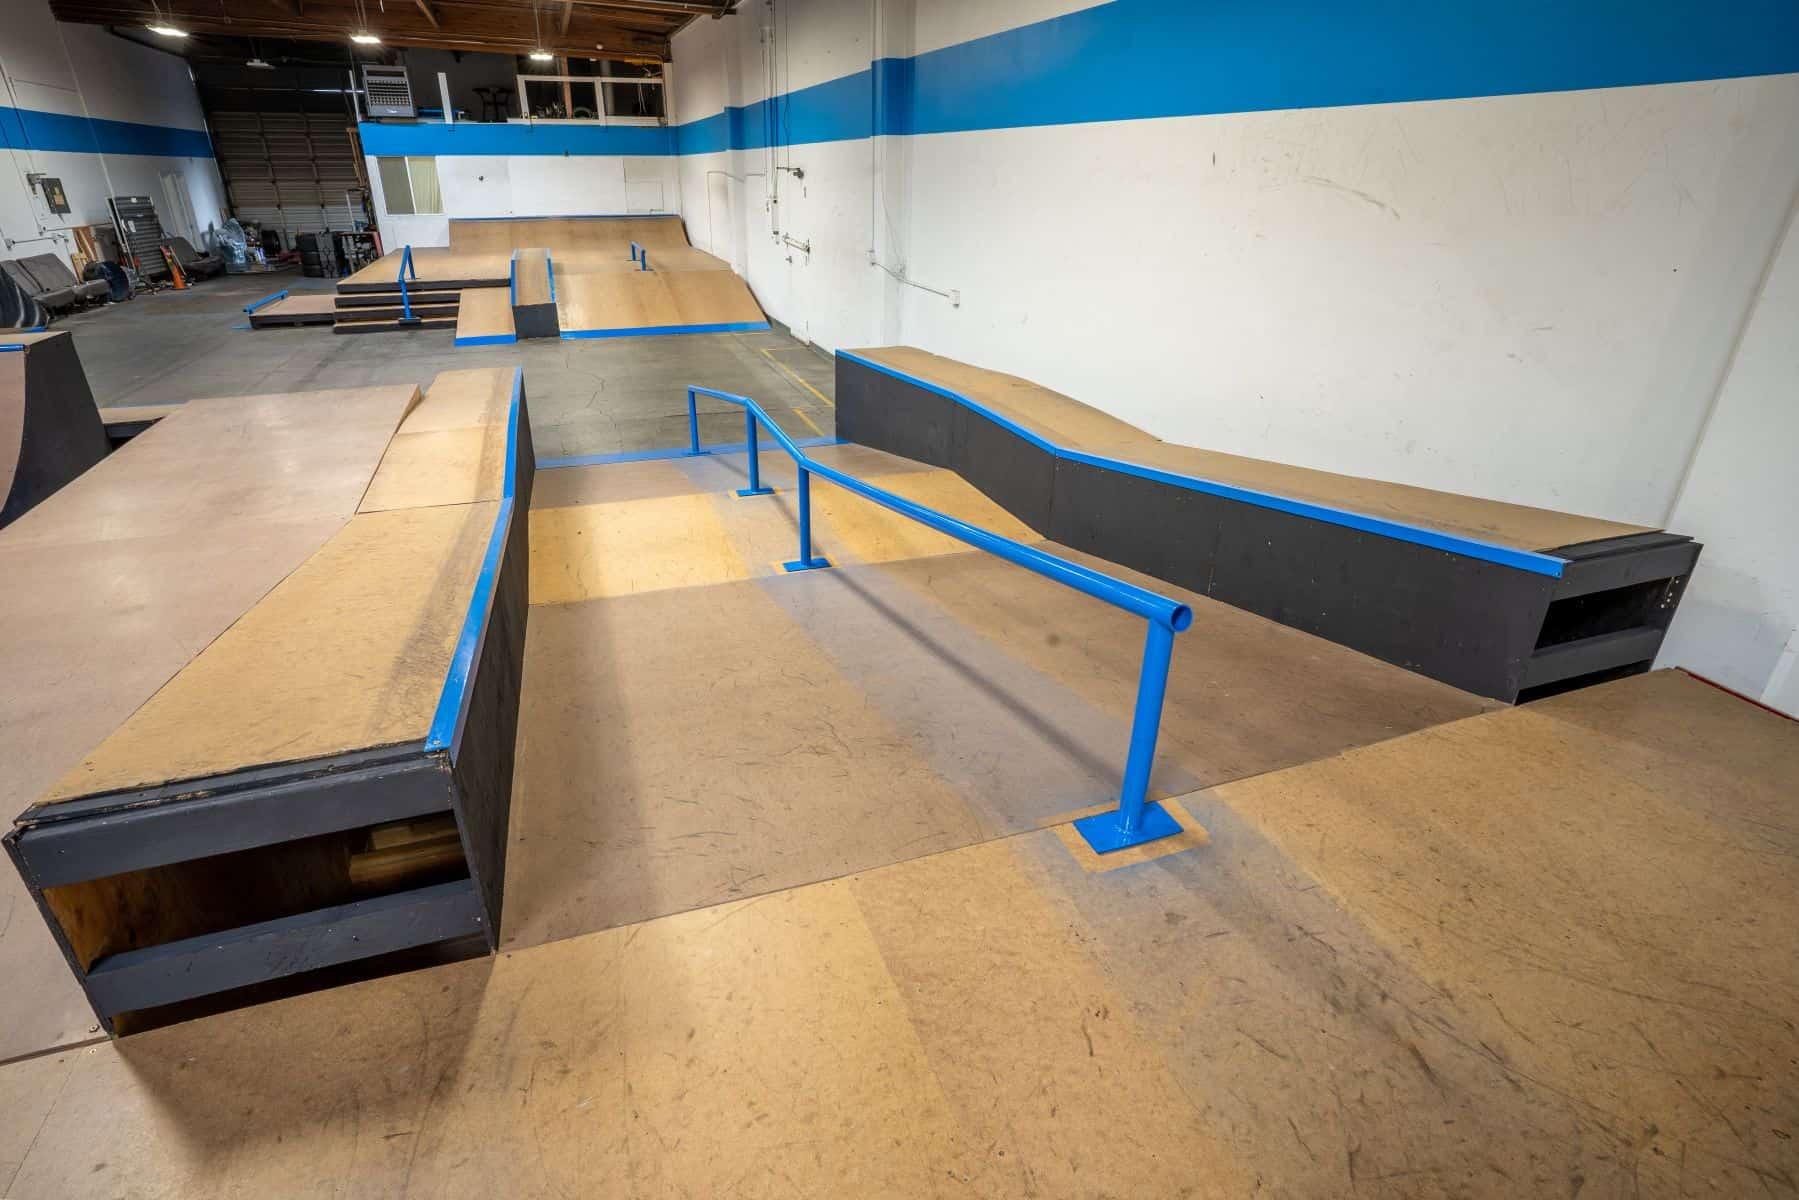 Rob Skate - San Leandro Private Skatepark 16